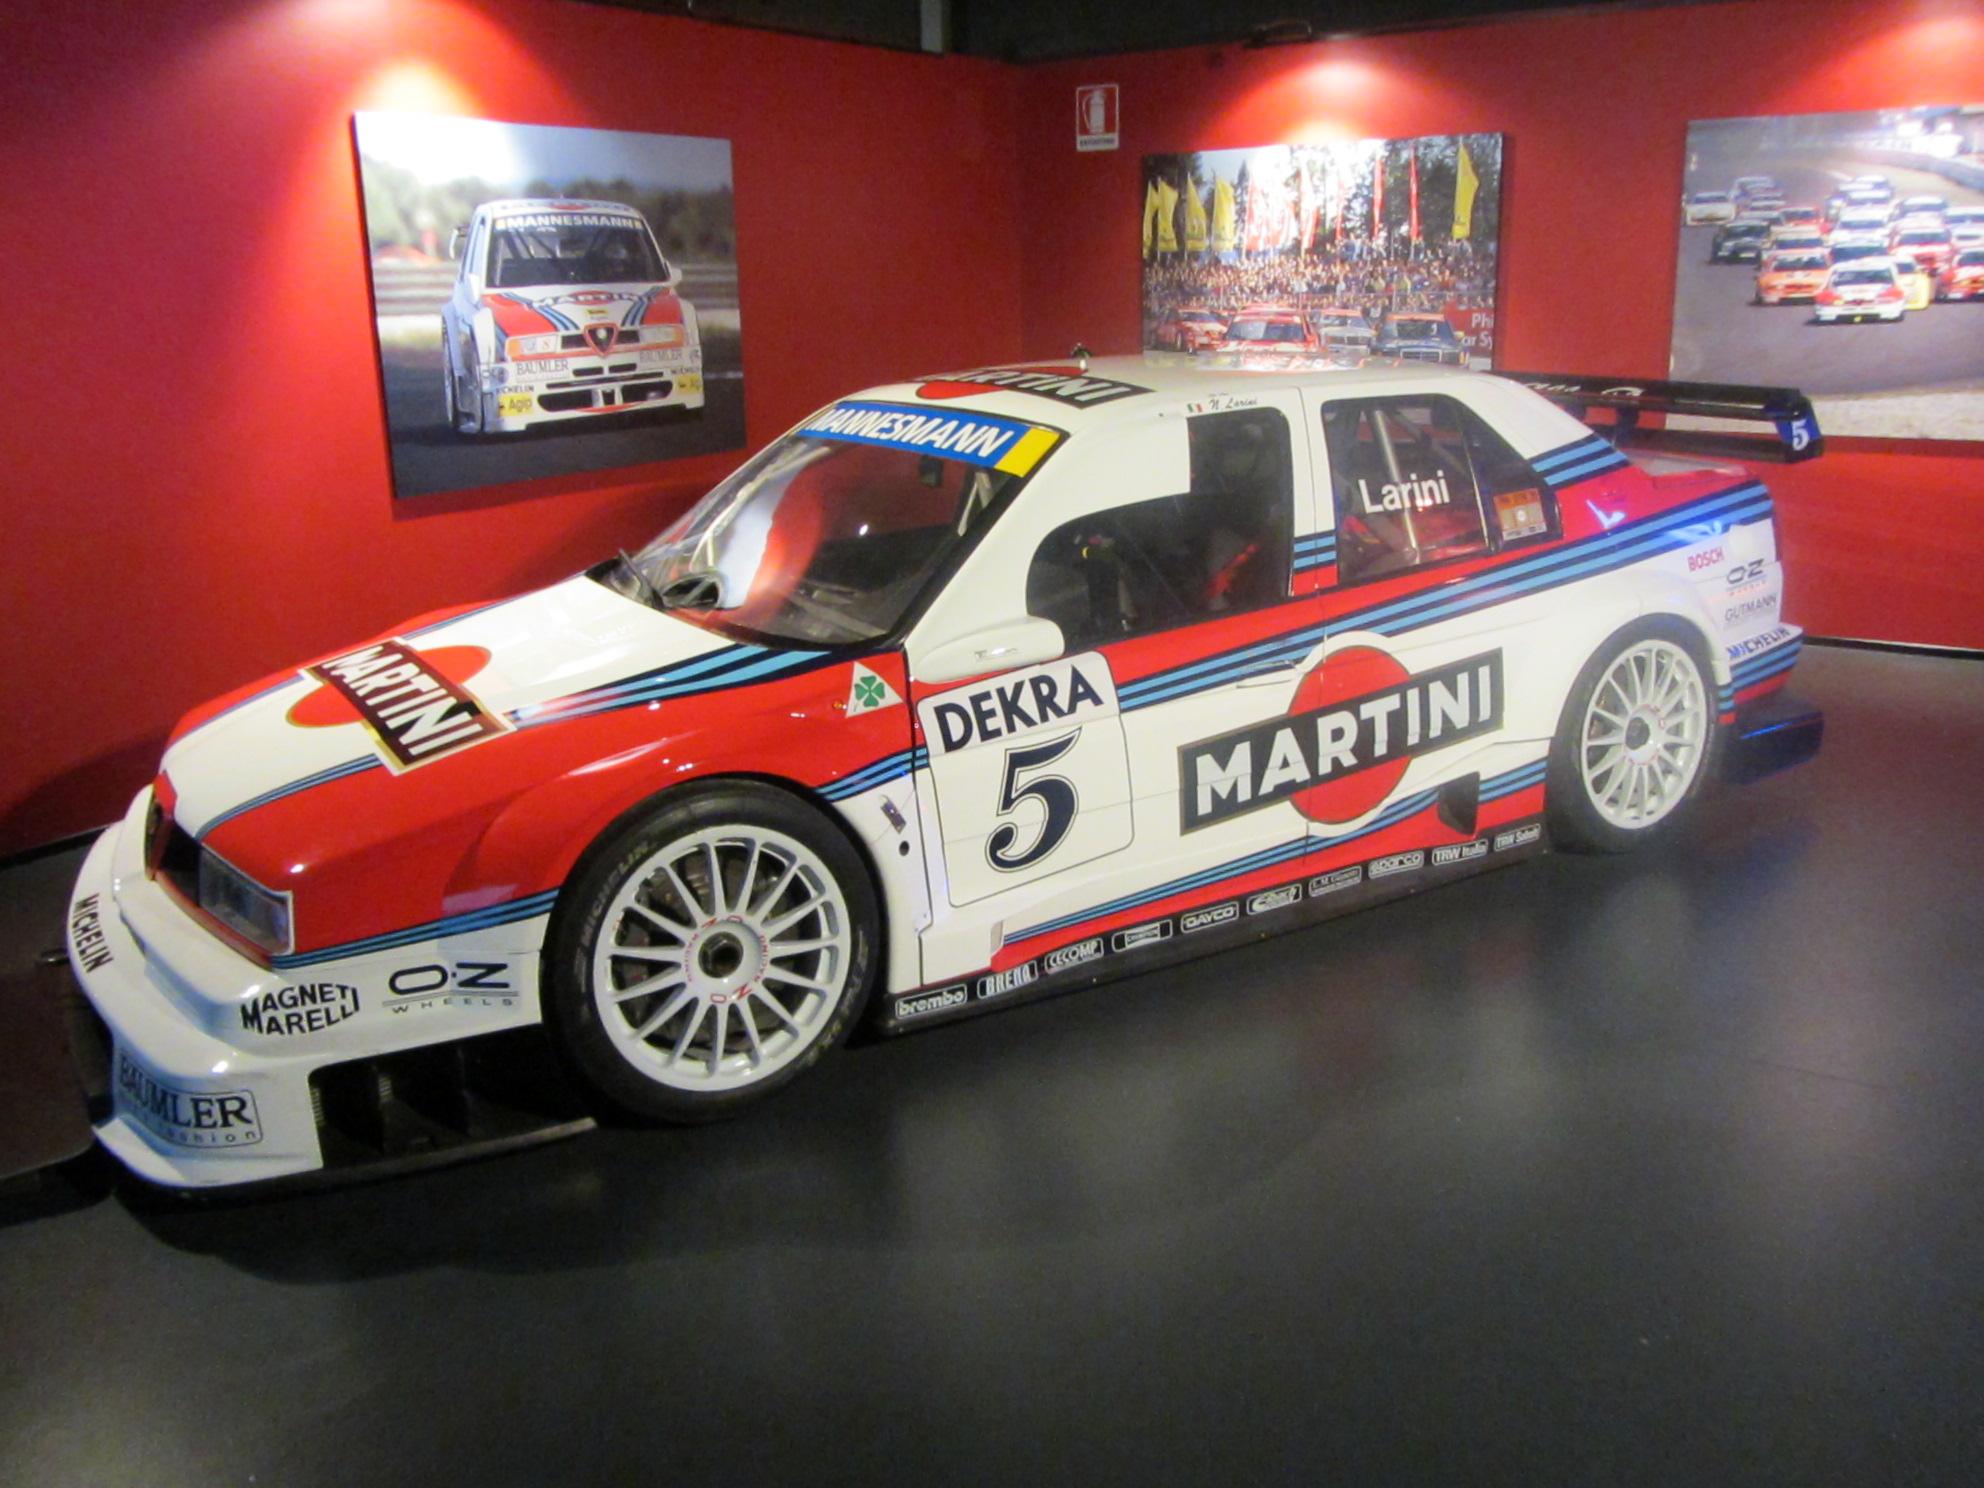 File:Alfa Romeo 155 V6 TI al MAUTO.JPG